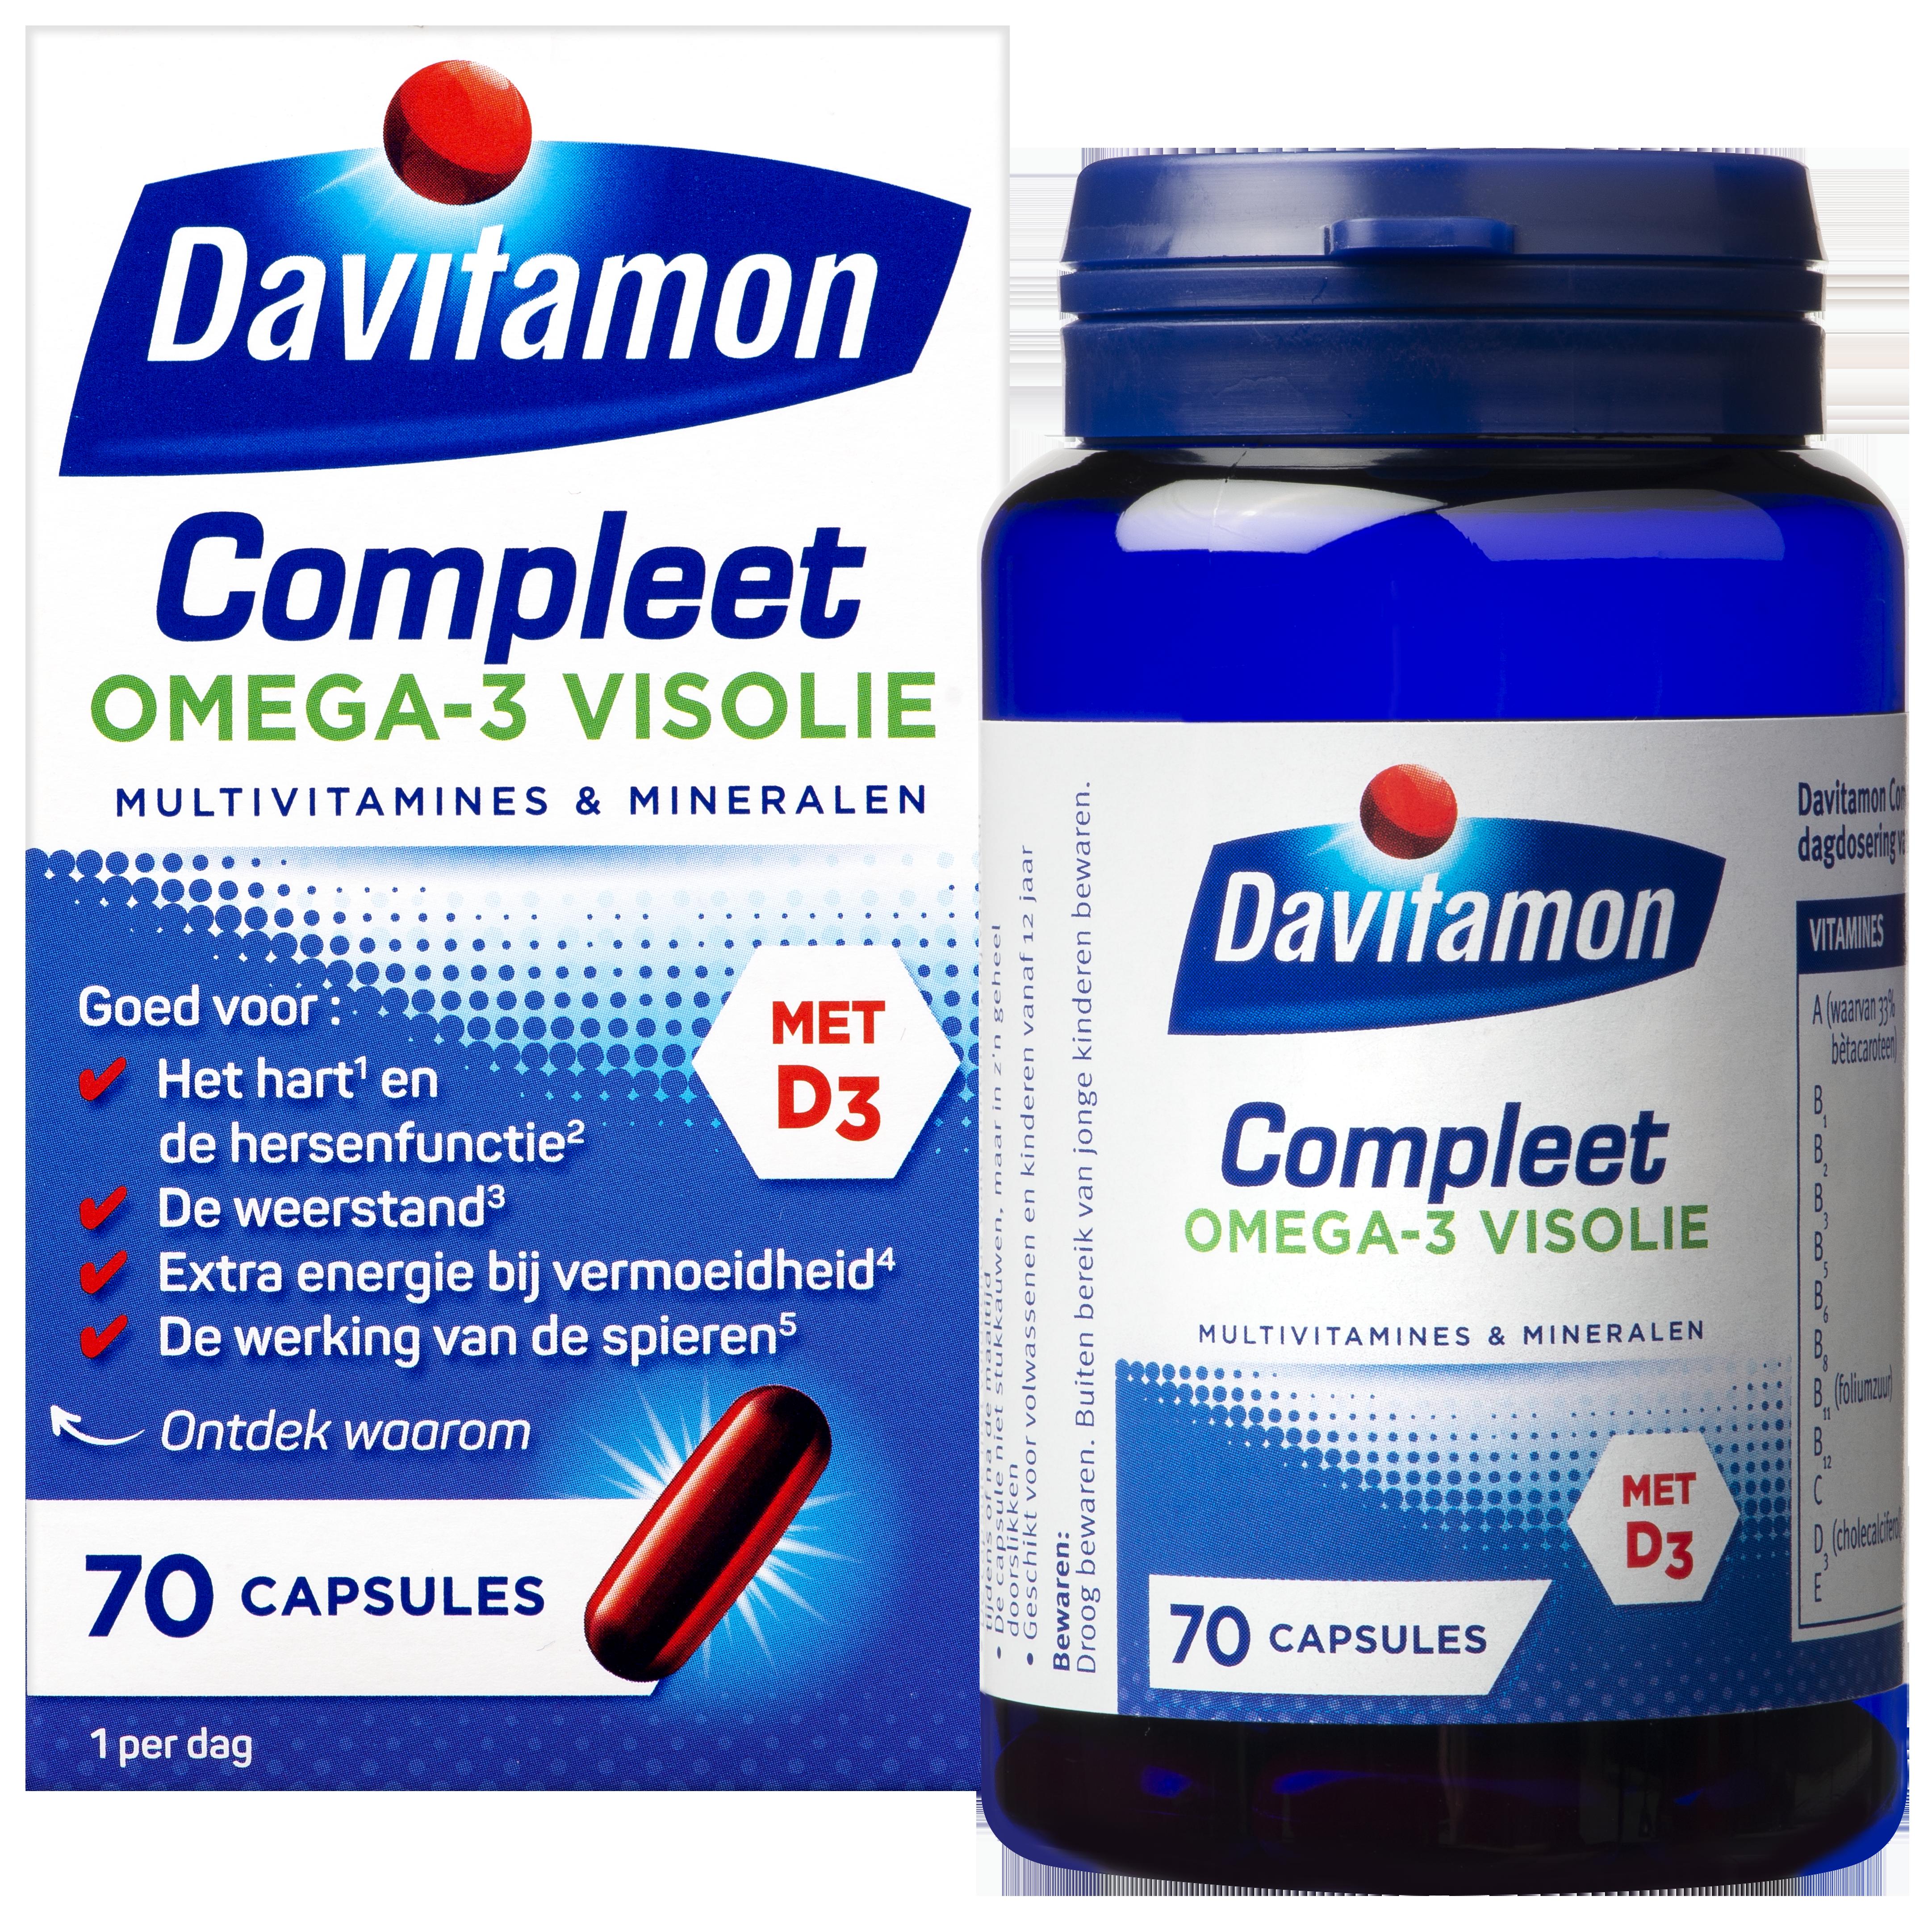 Davitamon Compleet Omega-3 Visolie – 70 capsules